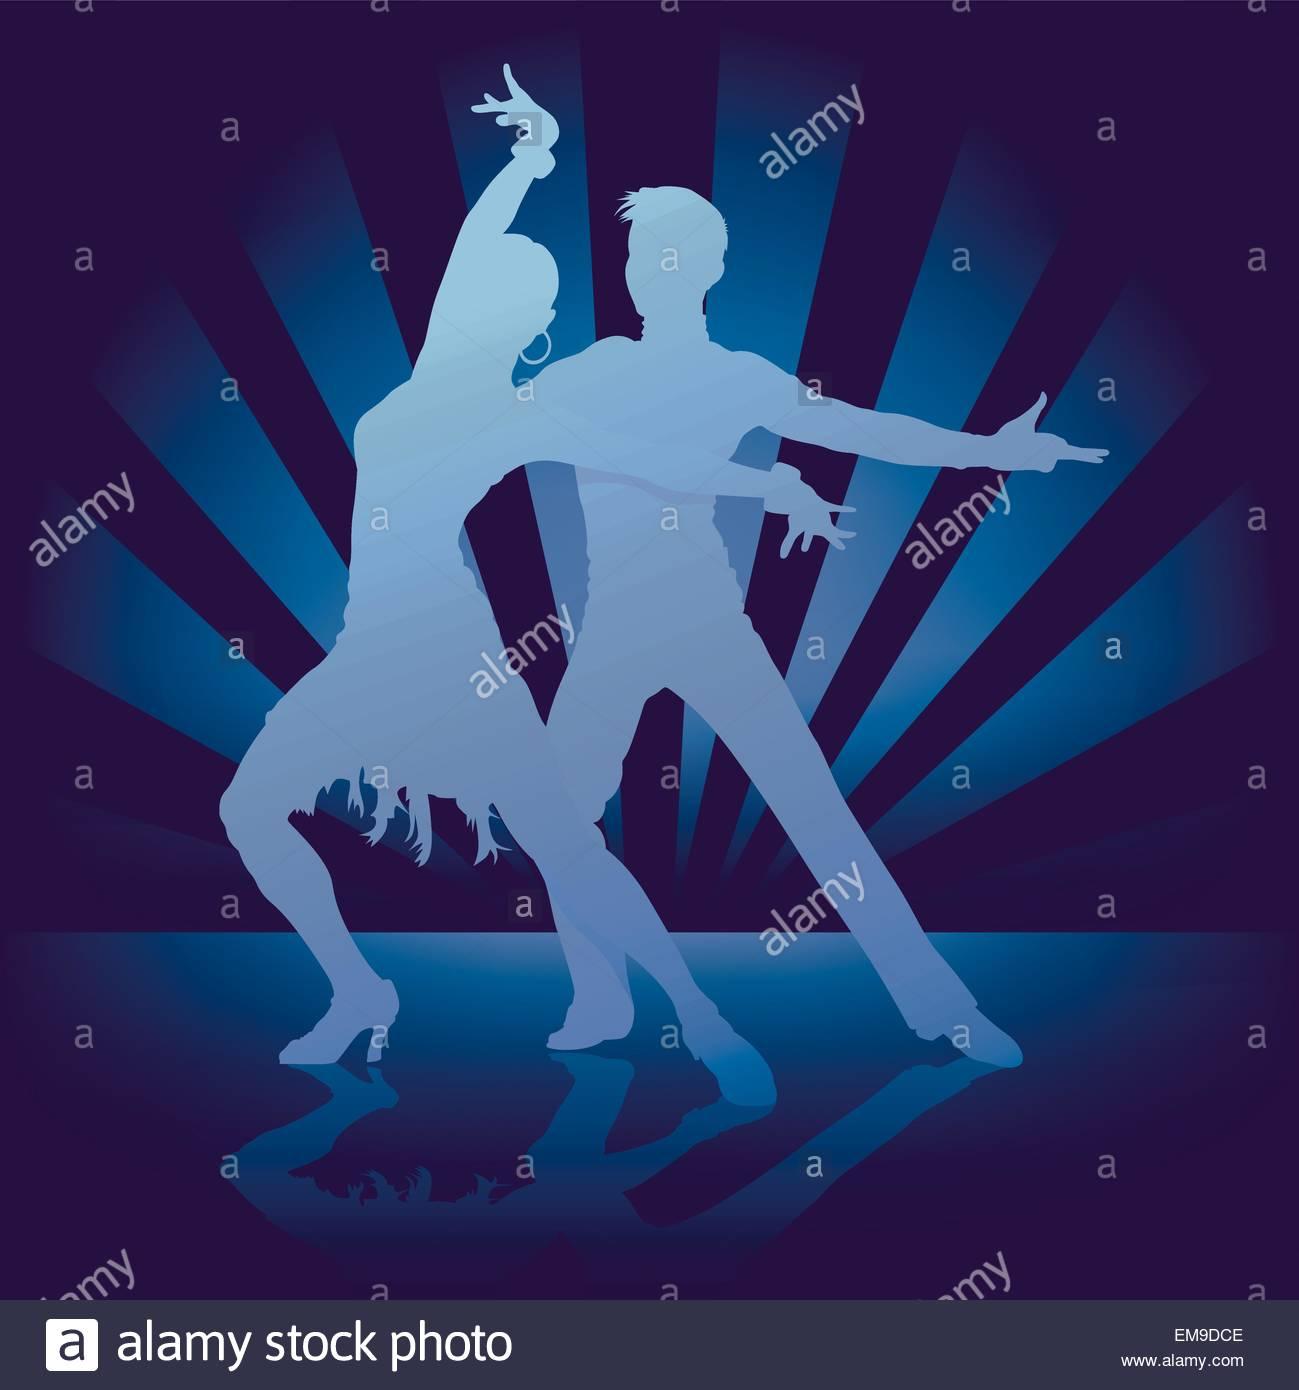 Dance Rumba - Stock Image